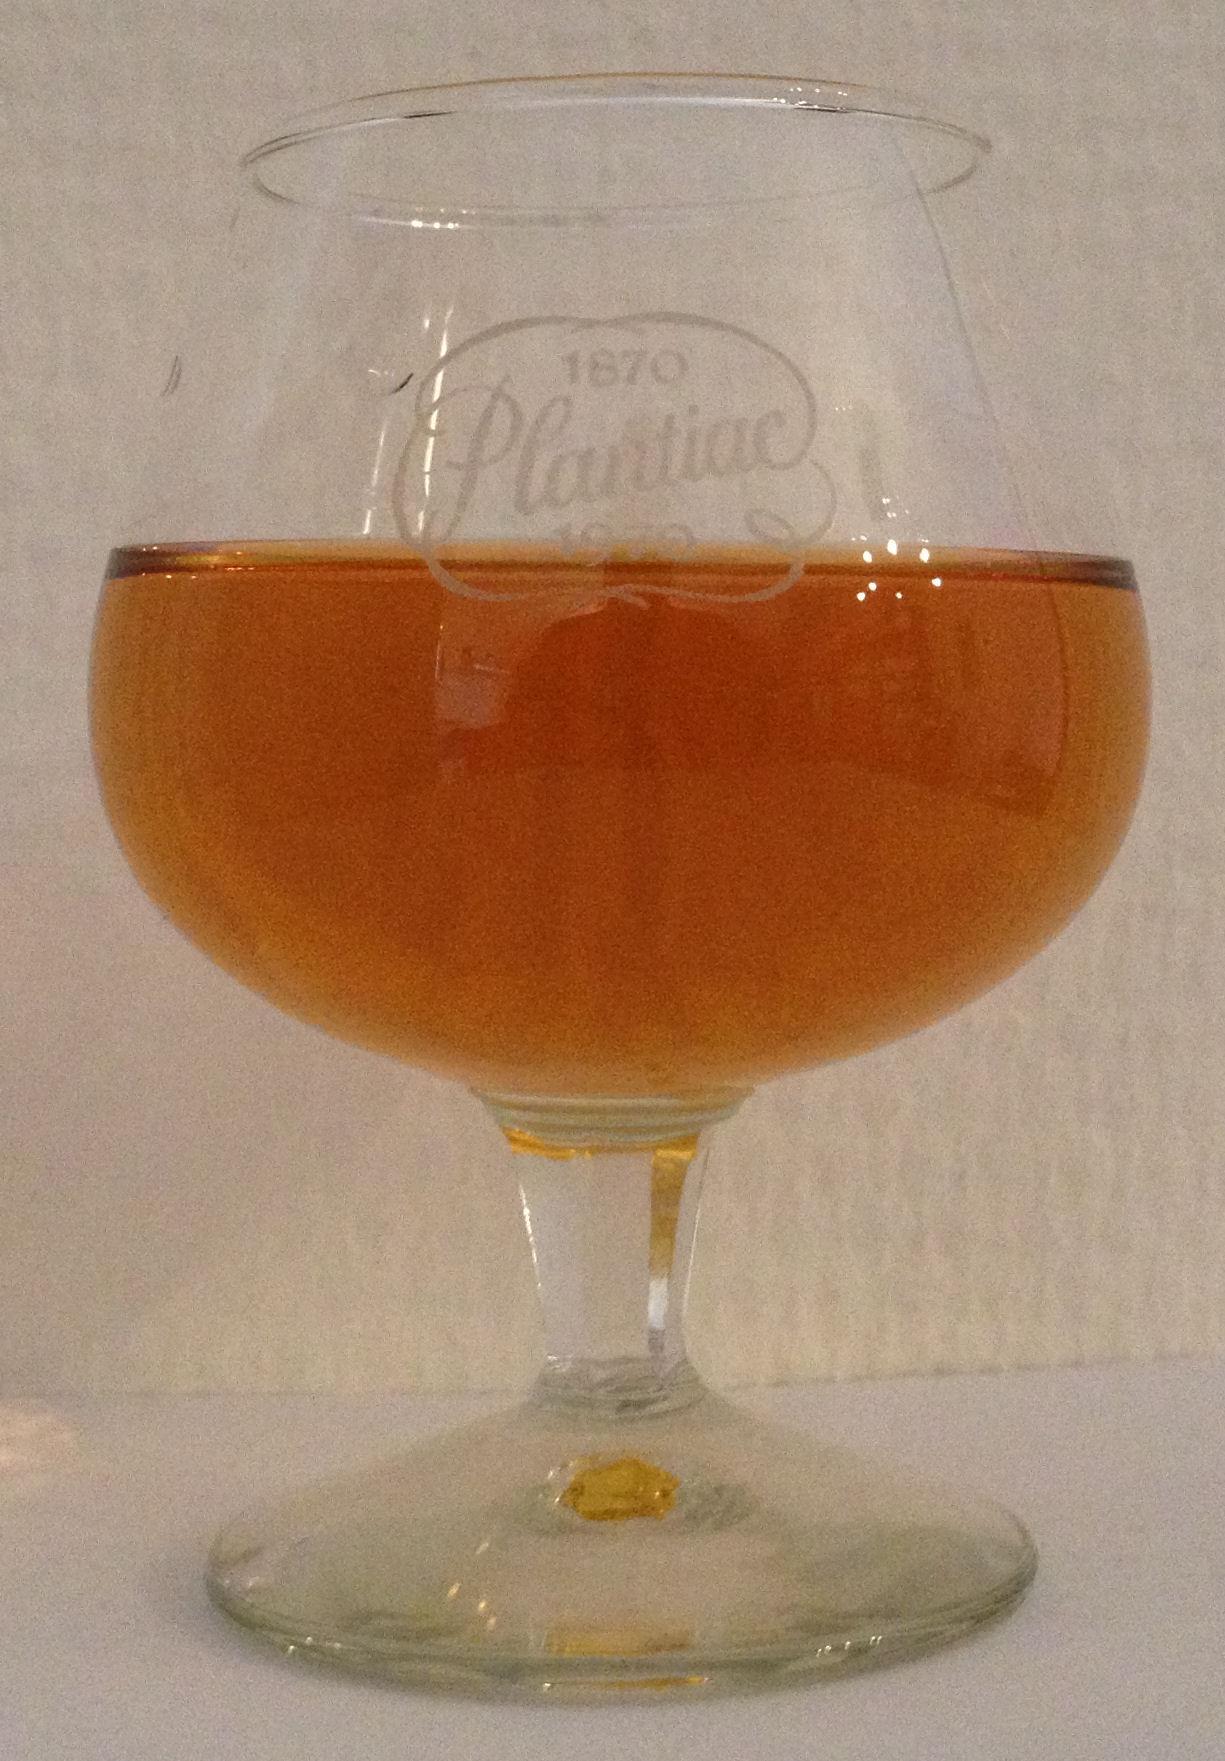 half filled glass